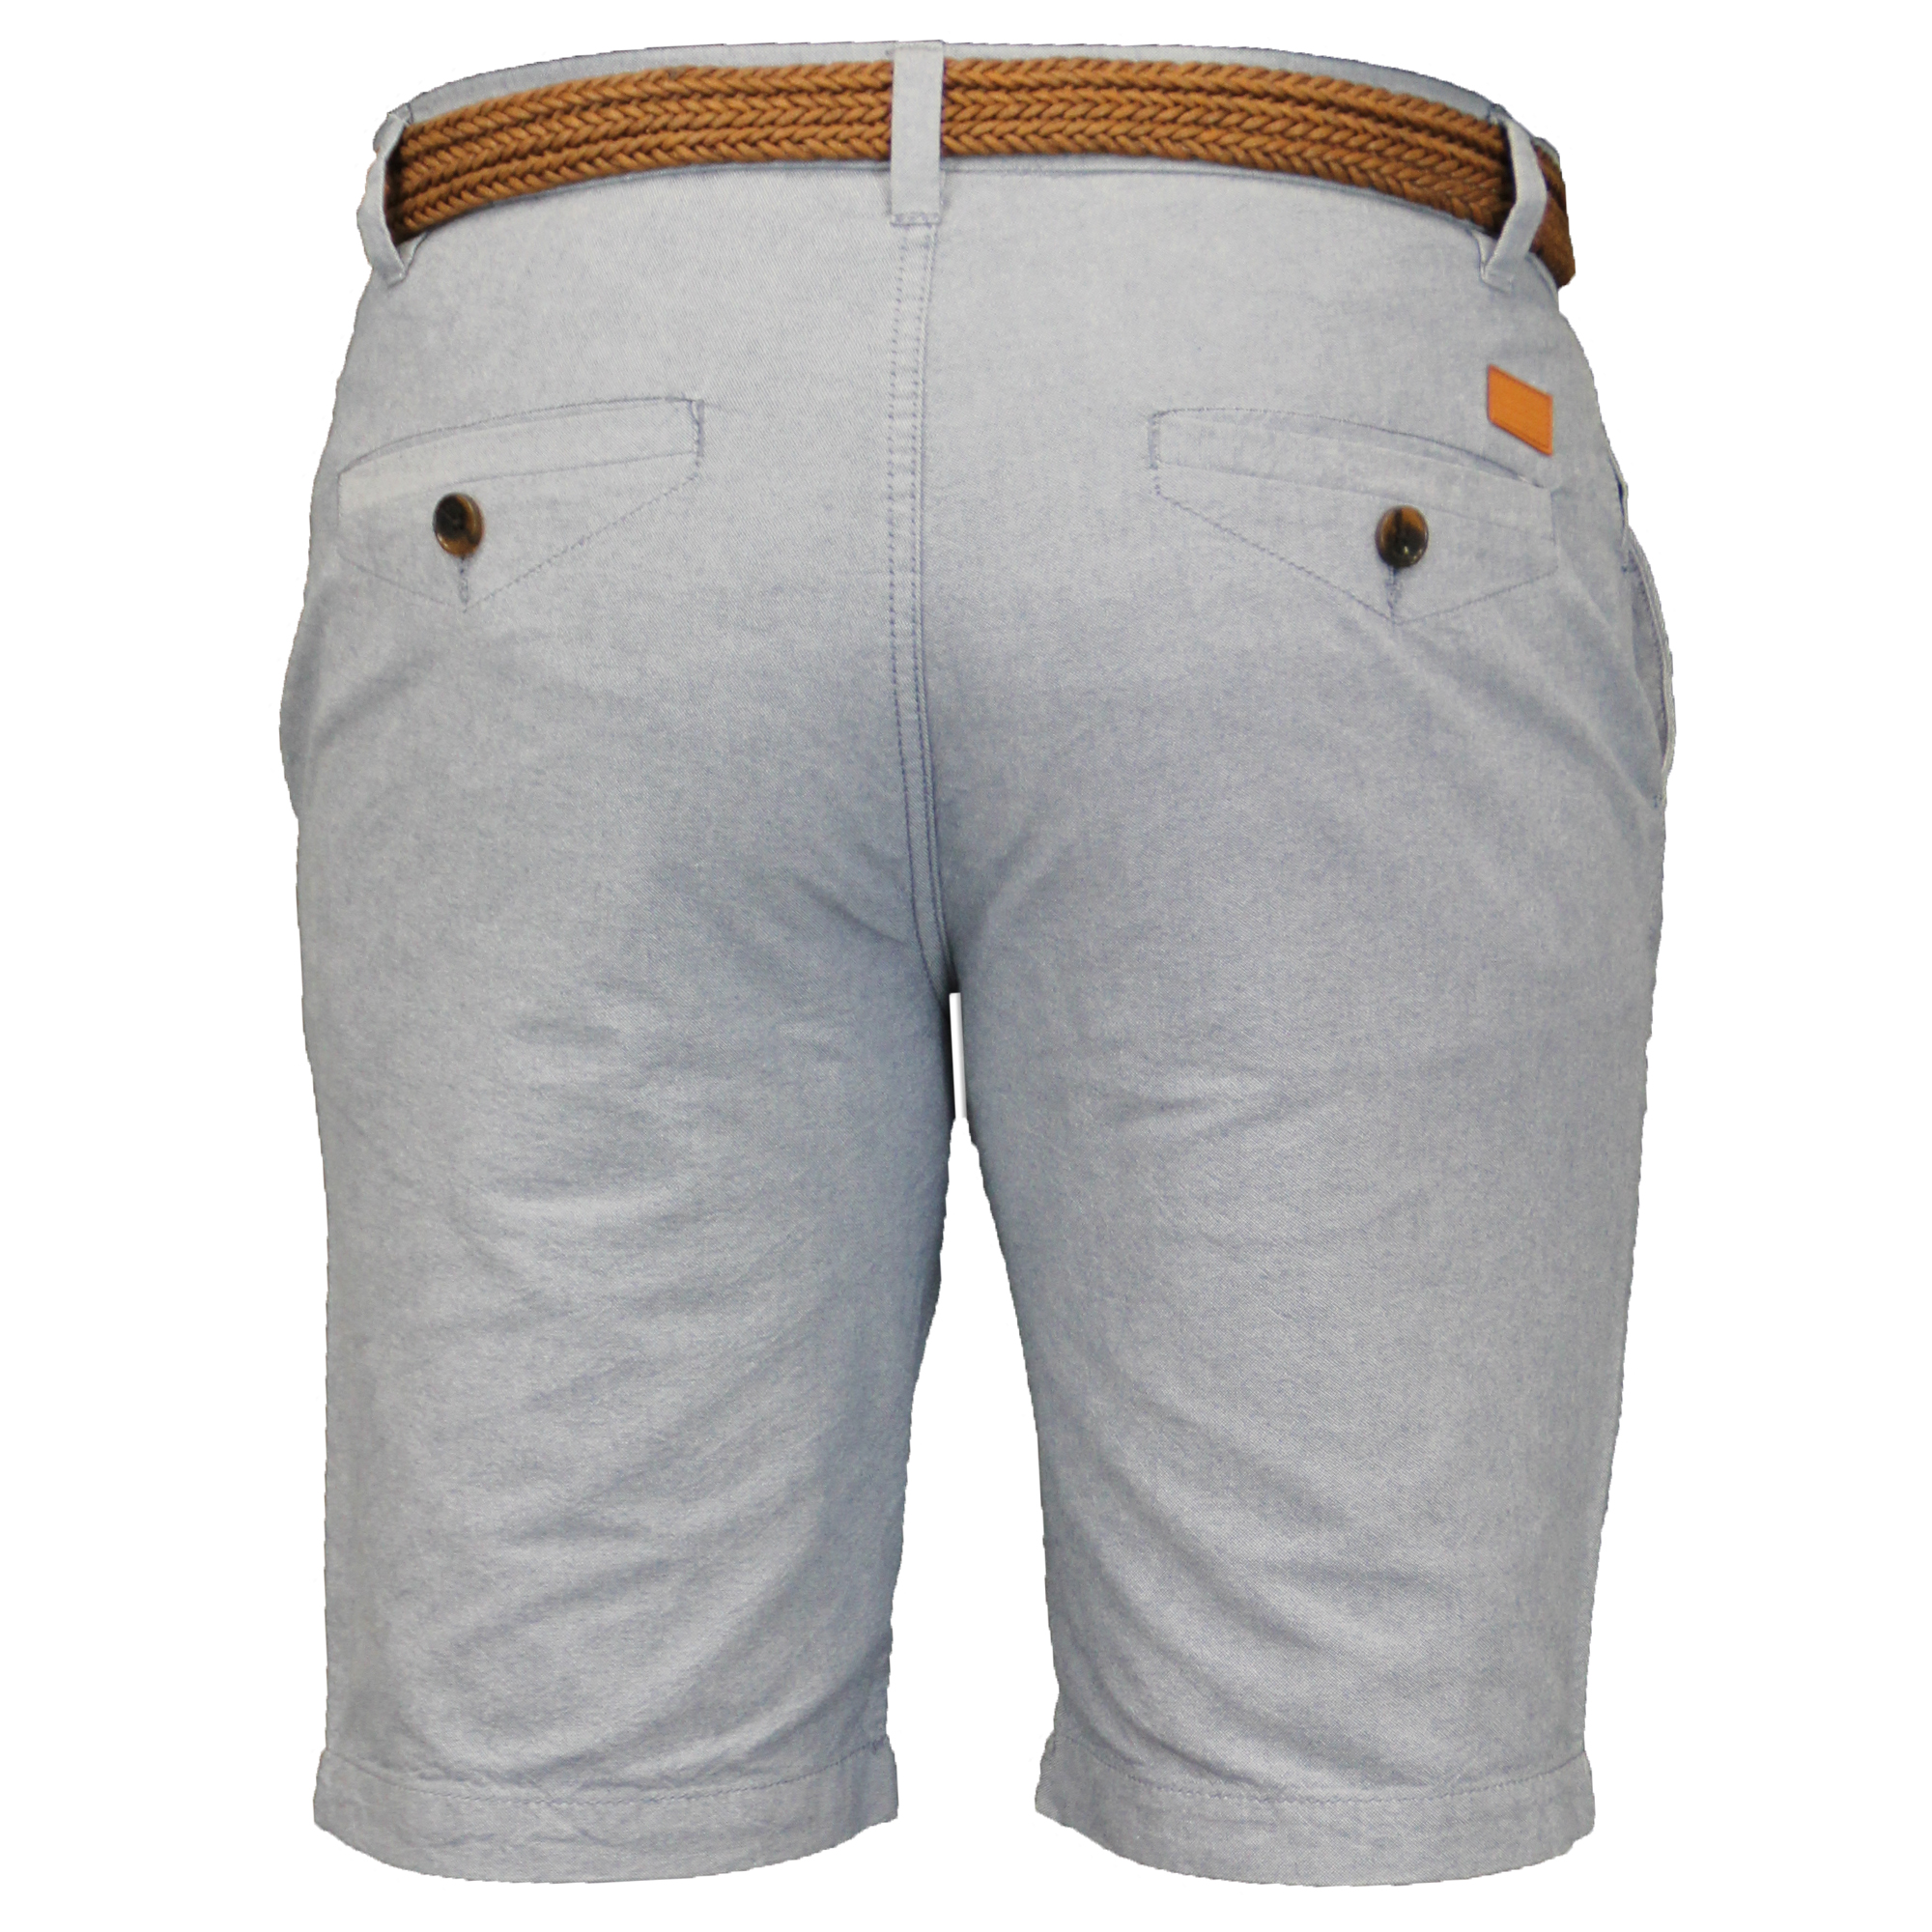 Mens-Cotton-Oxford-Chino-Shorts-Threadbare-Belted-Pants-Knee-Length-Summer-New thumbnail 5